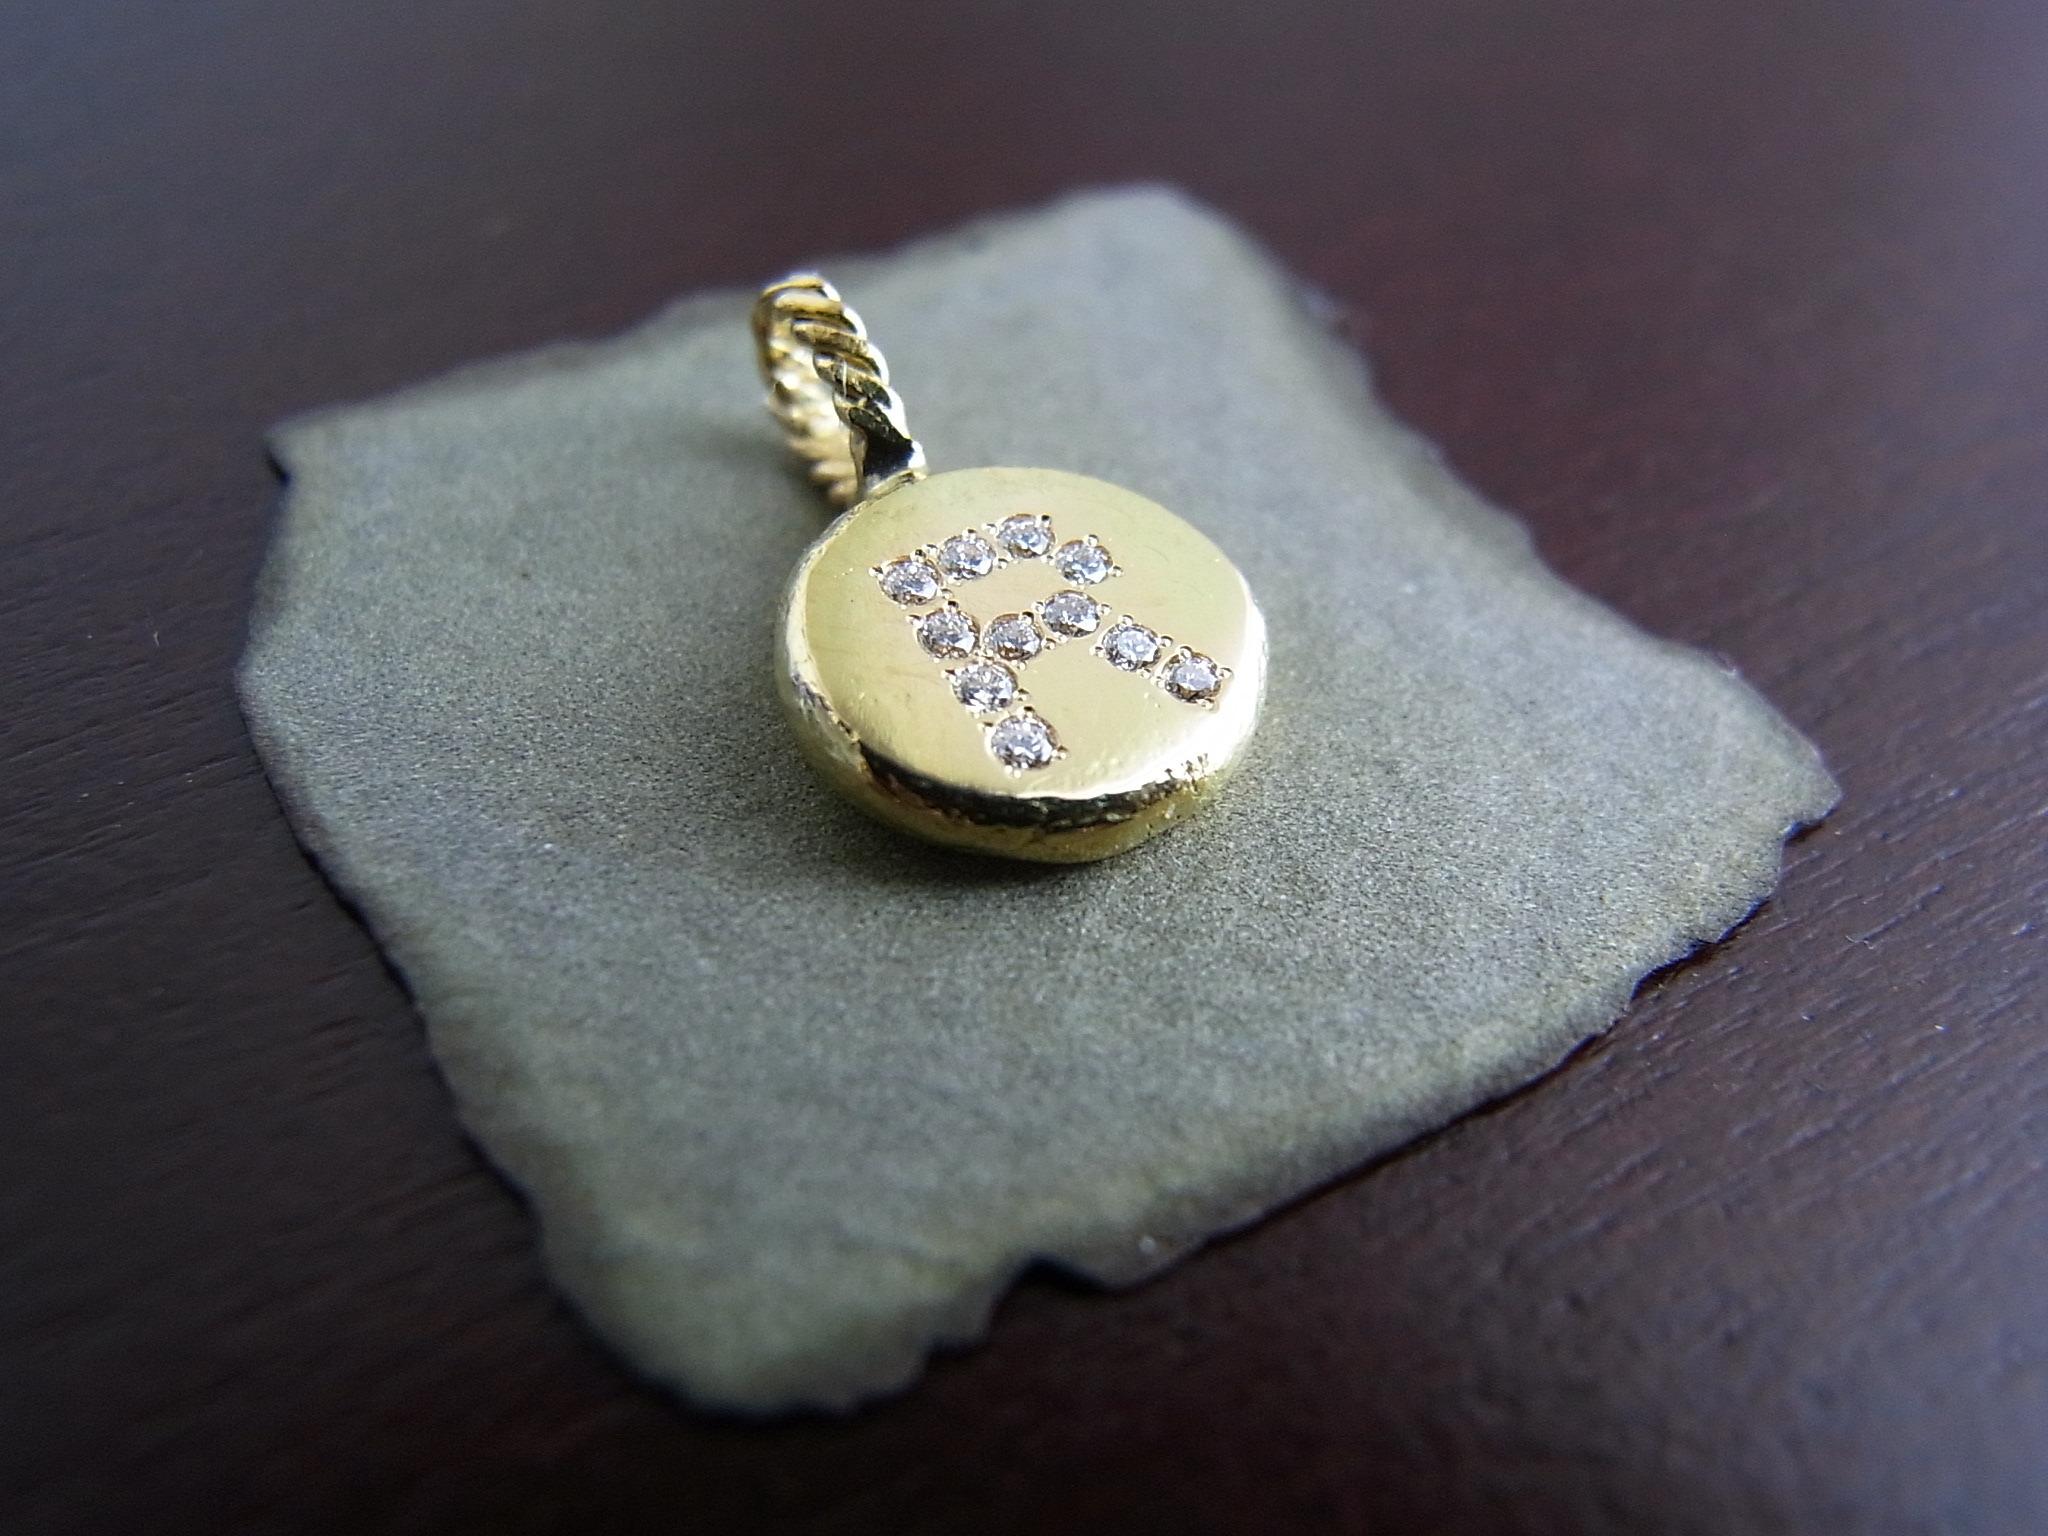 1g / K18×ダイヤモンド(orサファイヤ)・アルファベットA~Zペンダントトップ(チェーン別売)